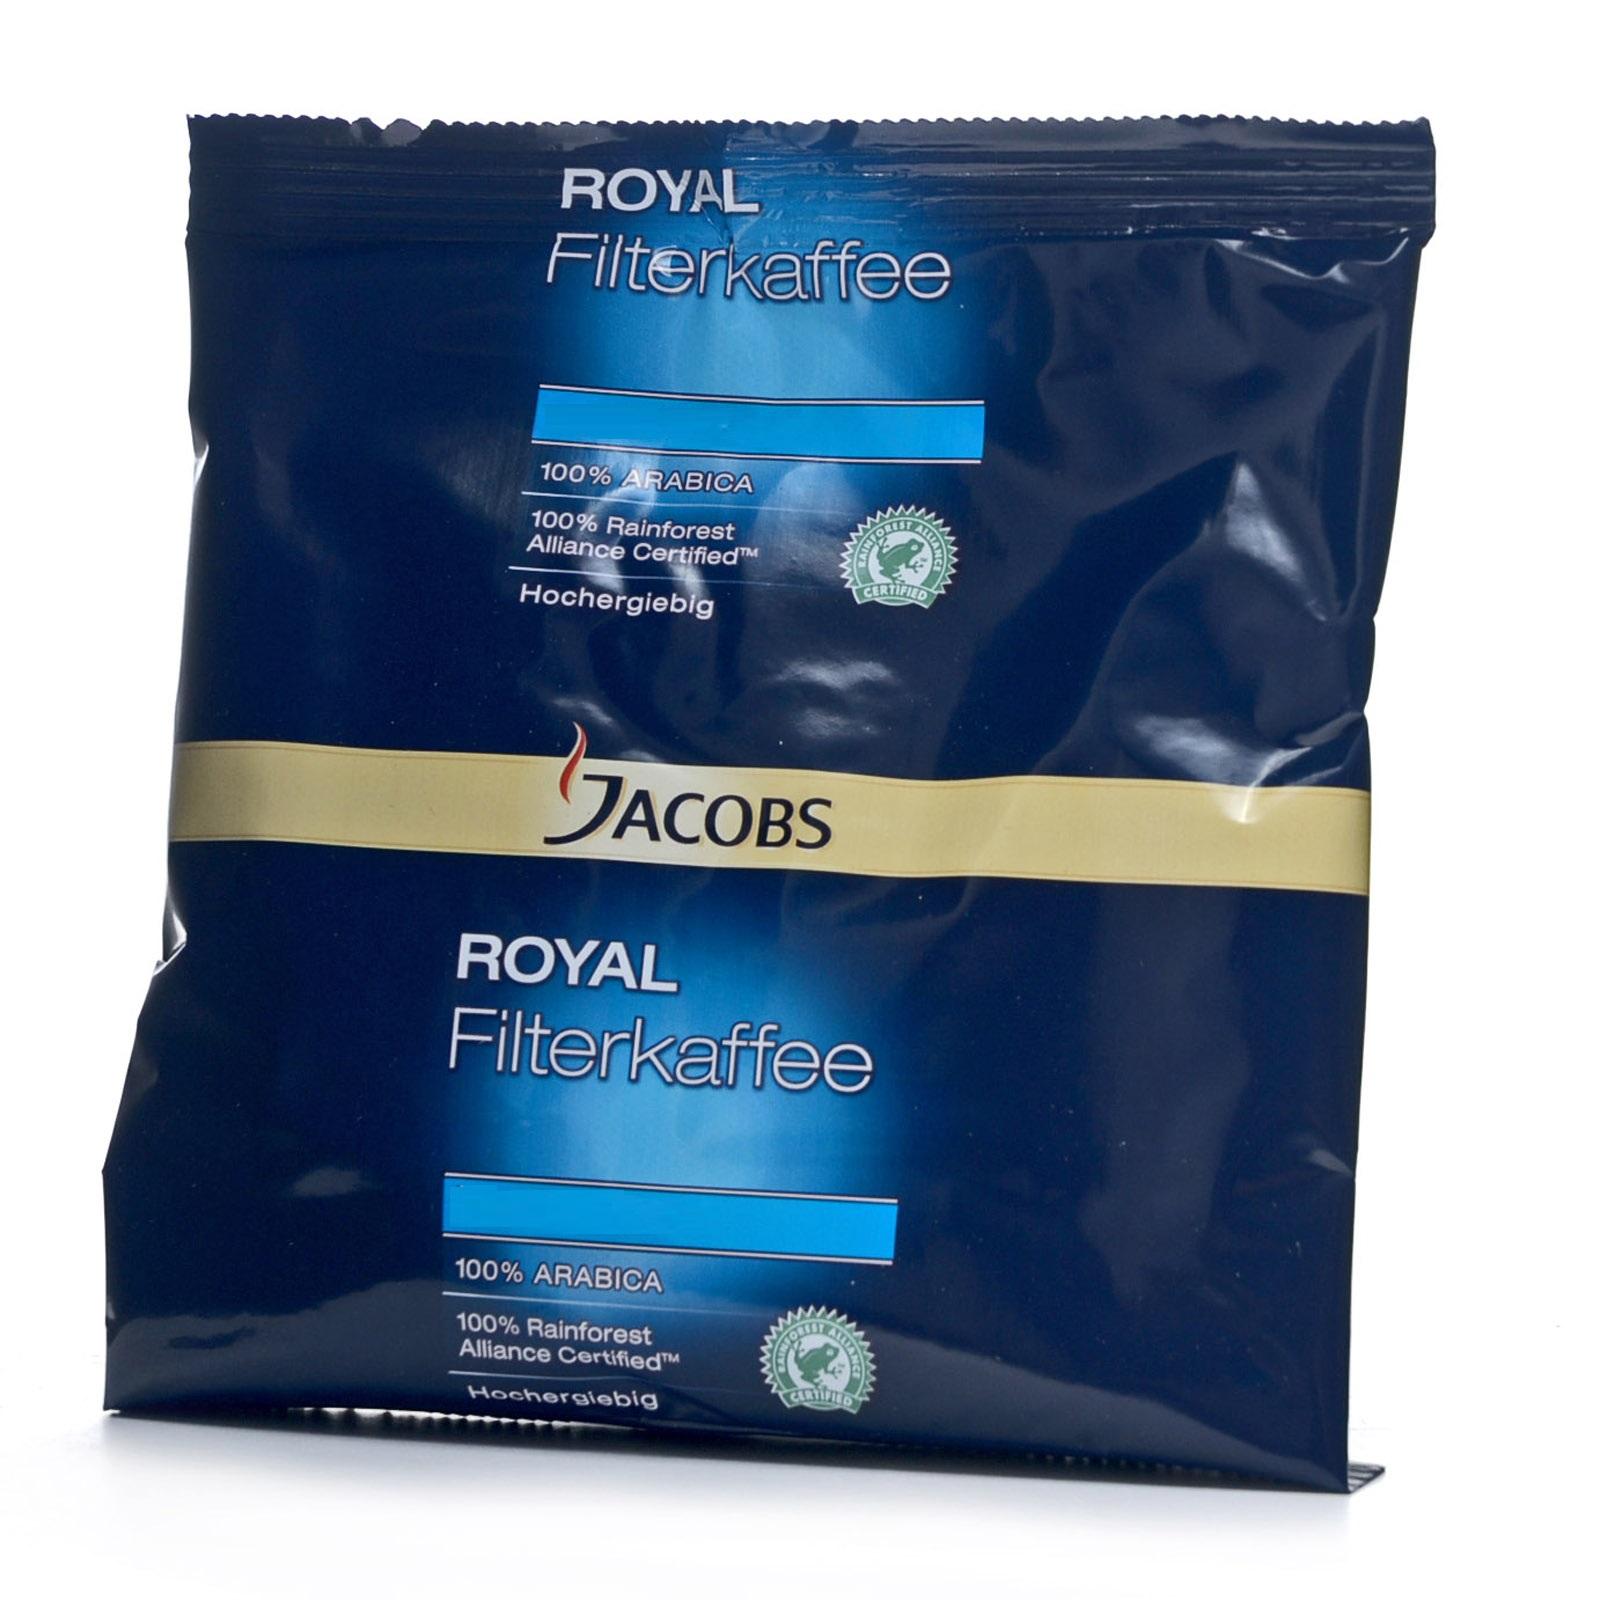 Jacobs Royal Elegant Filterkaffee Servicepaket + 50 Korbfilter 42 x 70g